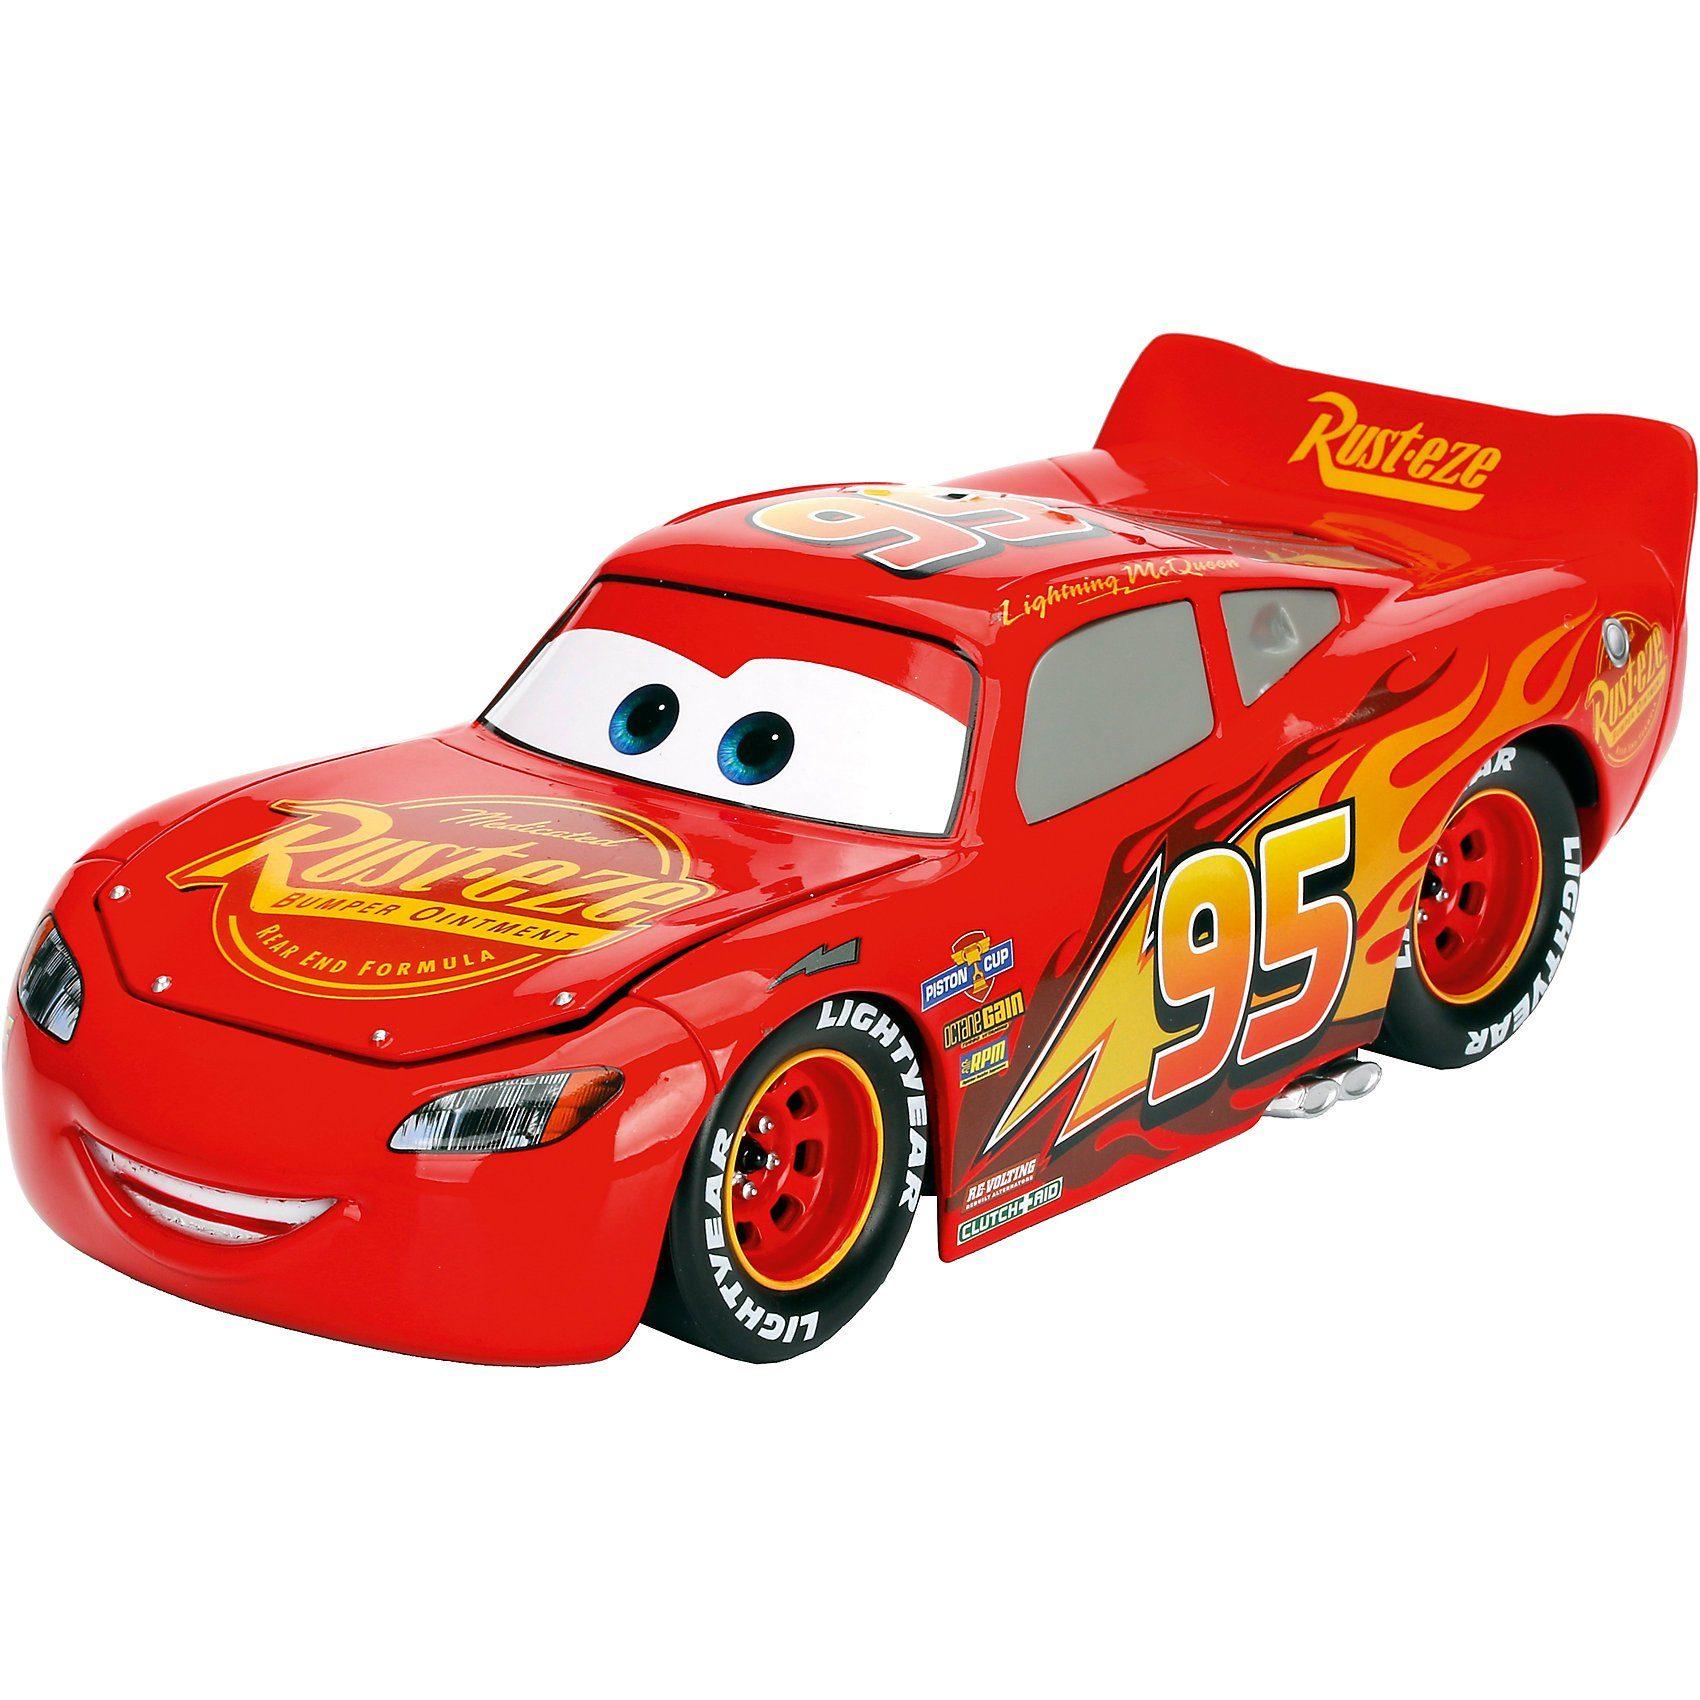 Joy Toy Cars Lightning McQueen Metal Diecast 1:24 25x15x12 cm